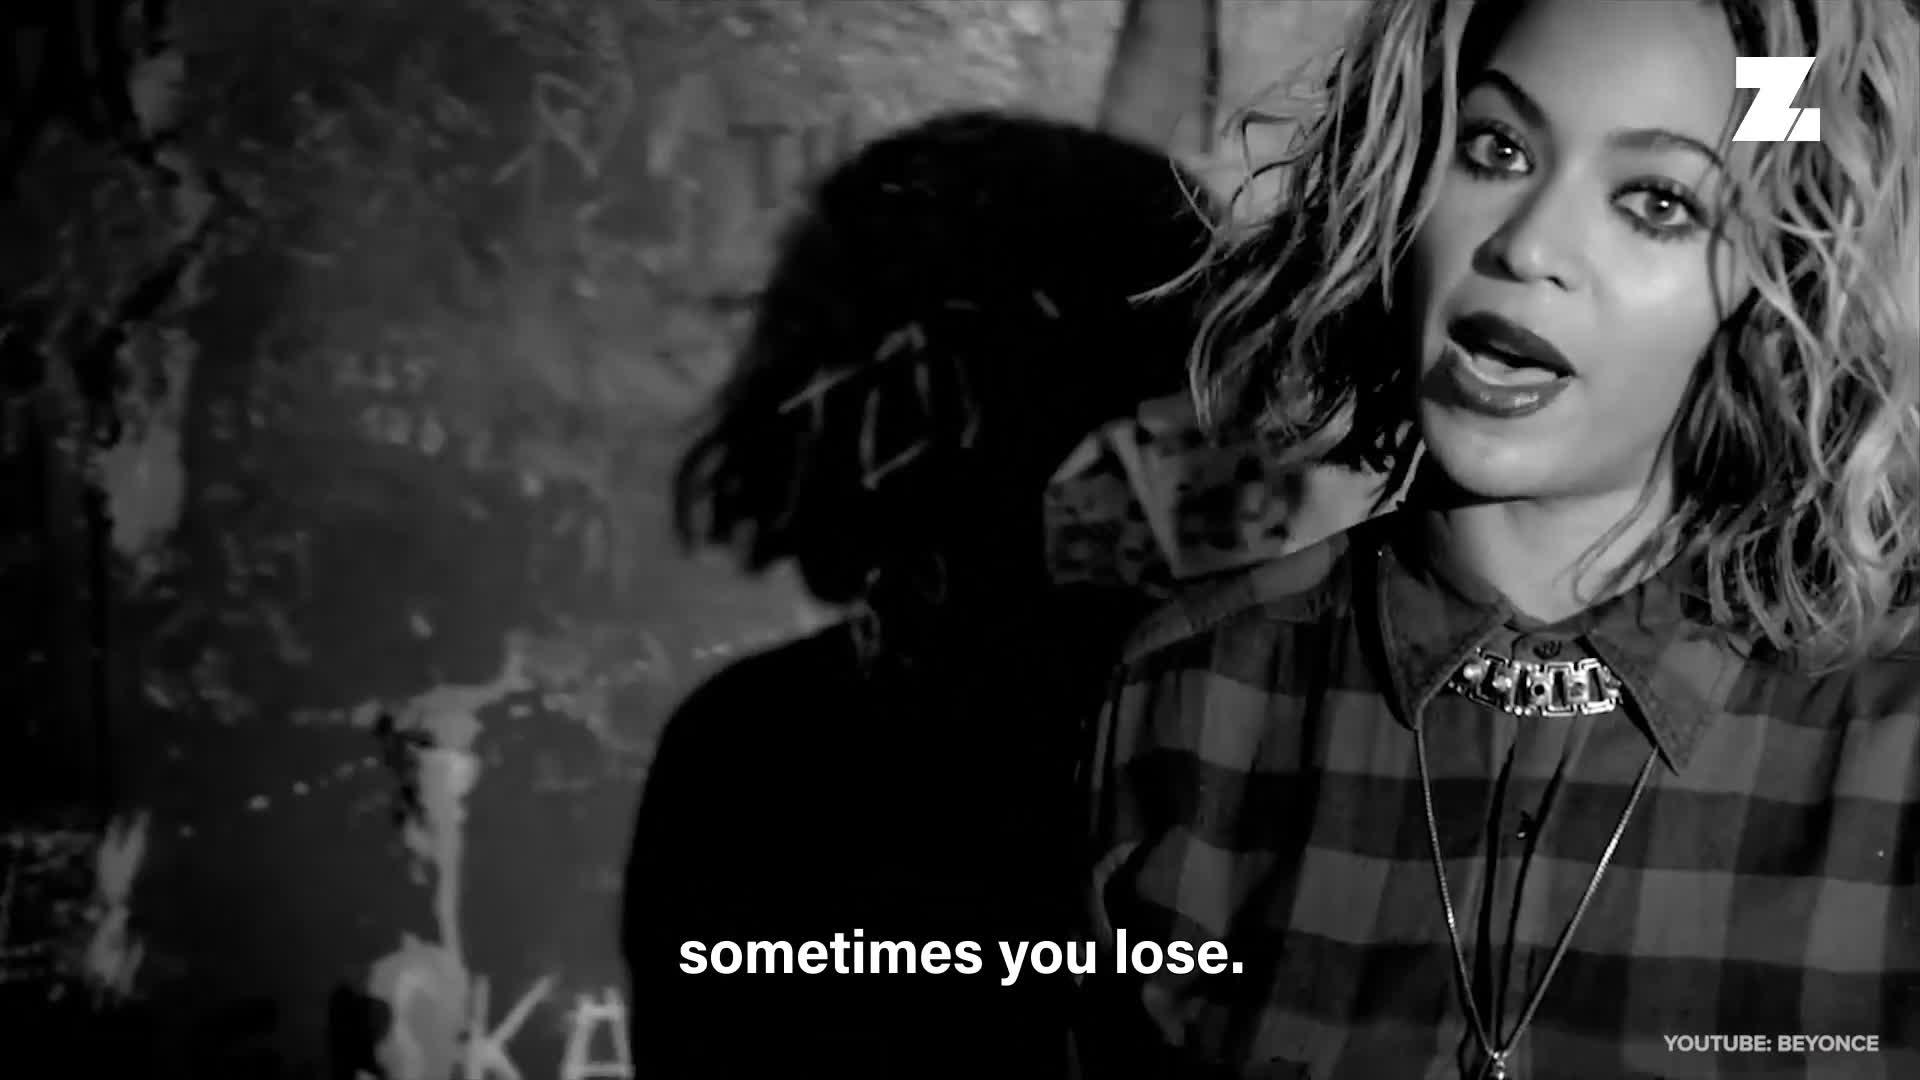 The best advice Beyoncé has ever shared